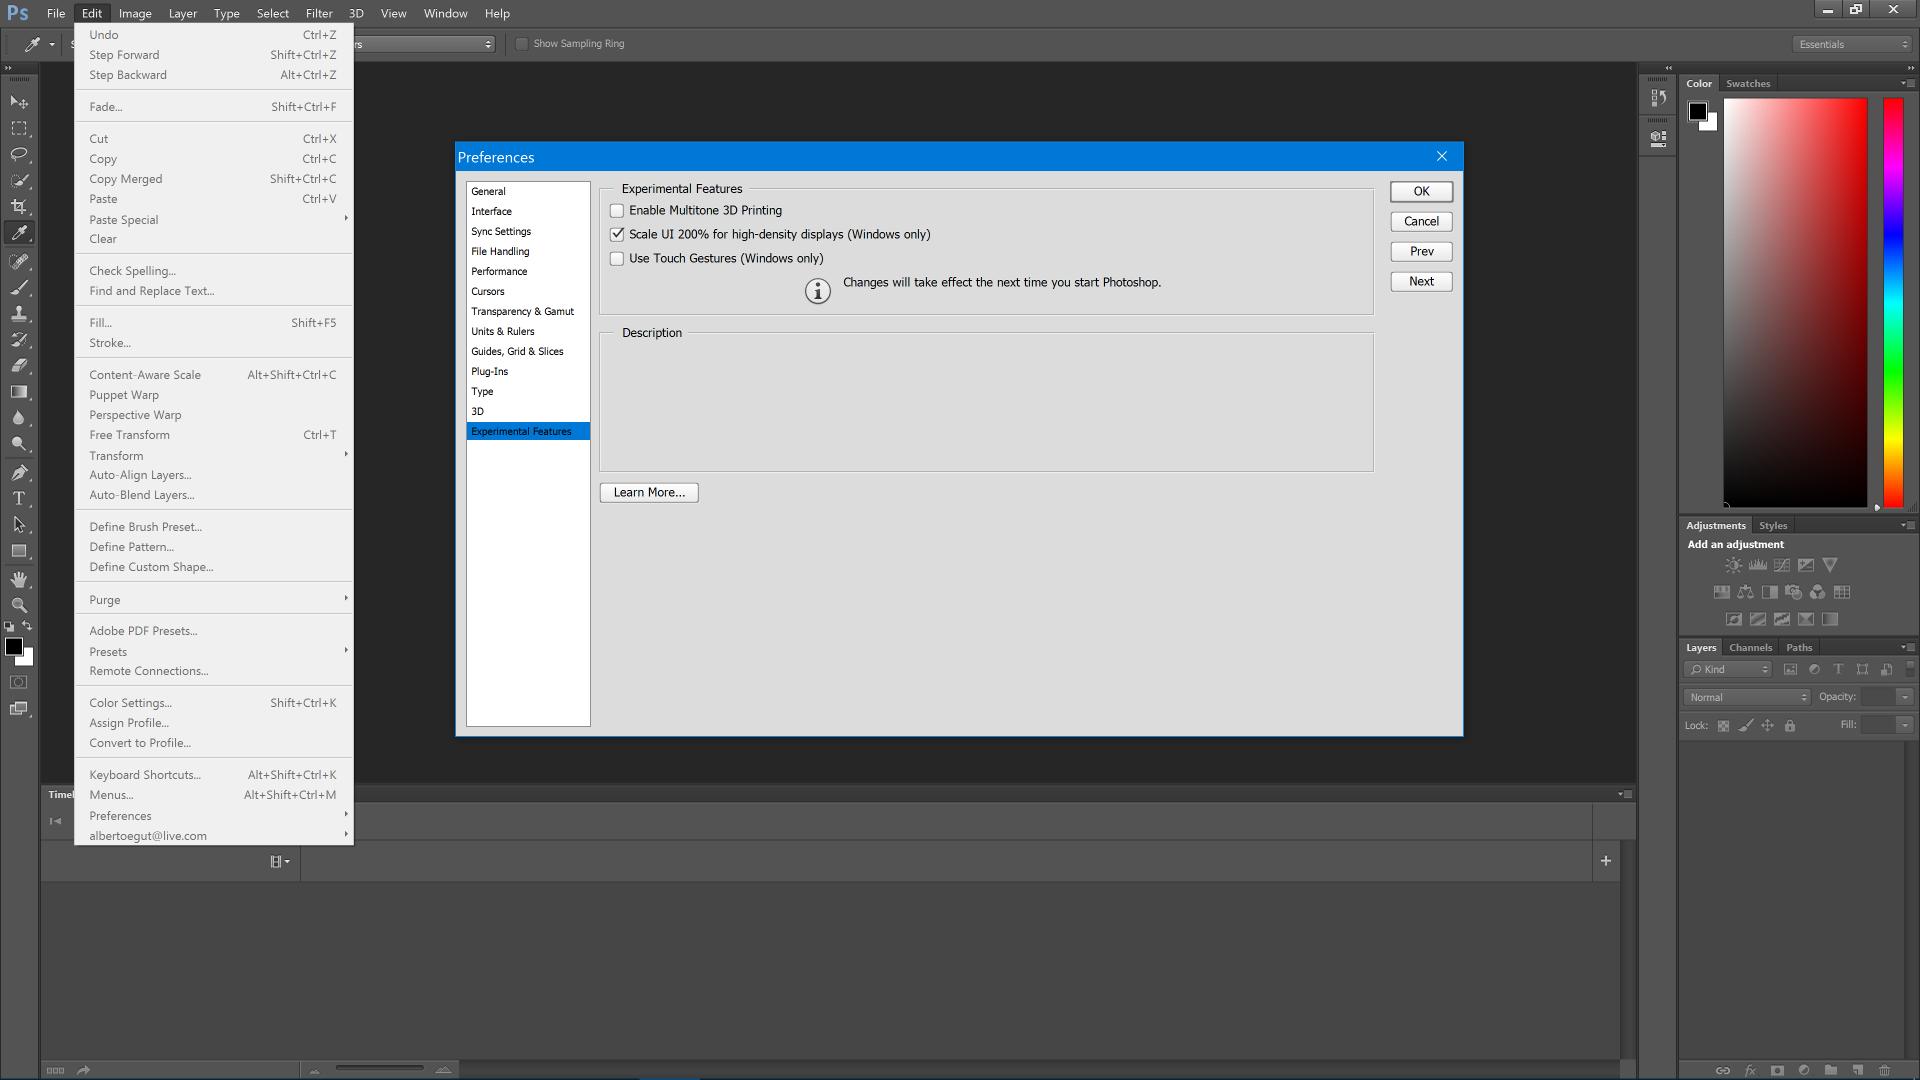 CS6 Menus and Icons too small on Windows 8.1